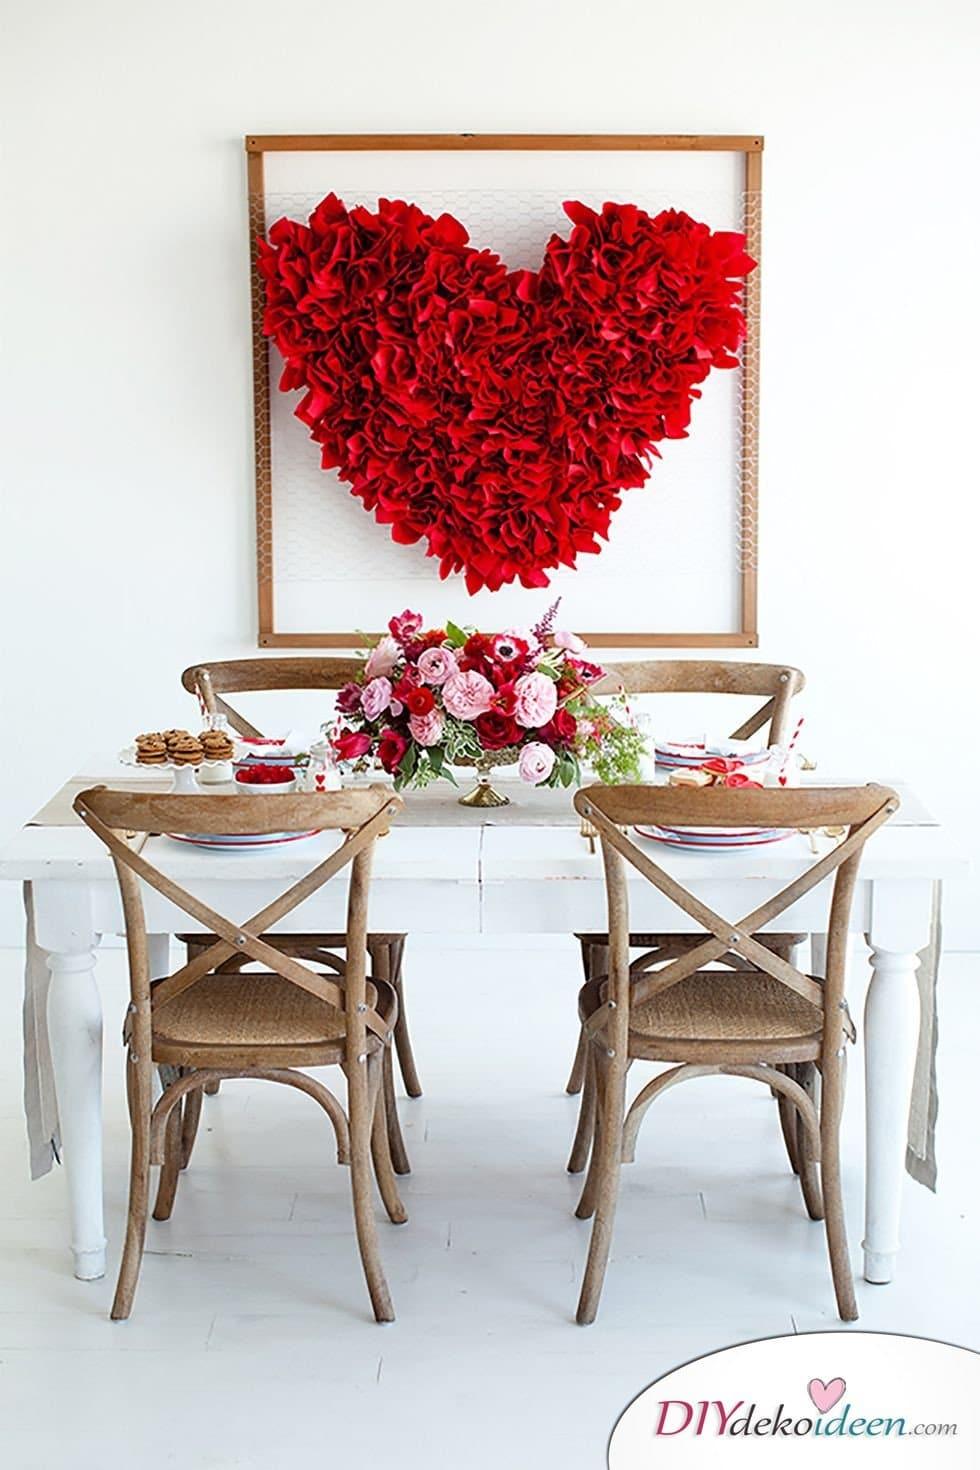 Herzdeko, Valentinstag Deko Ideen, Deko Valentinstag, dekorieren, DIY Dekoideen, Deko basteln, romantische Deko, Wanddeko Valentinstag